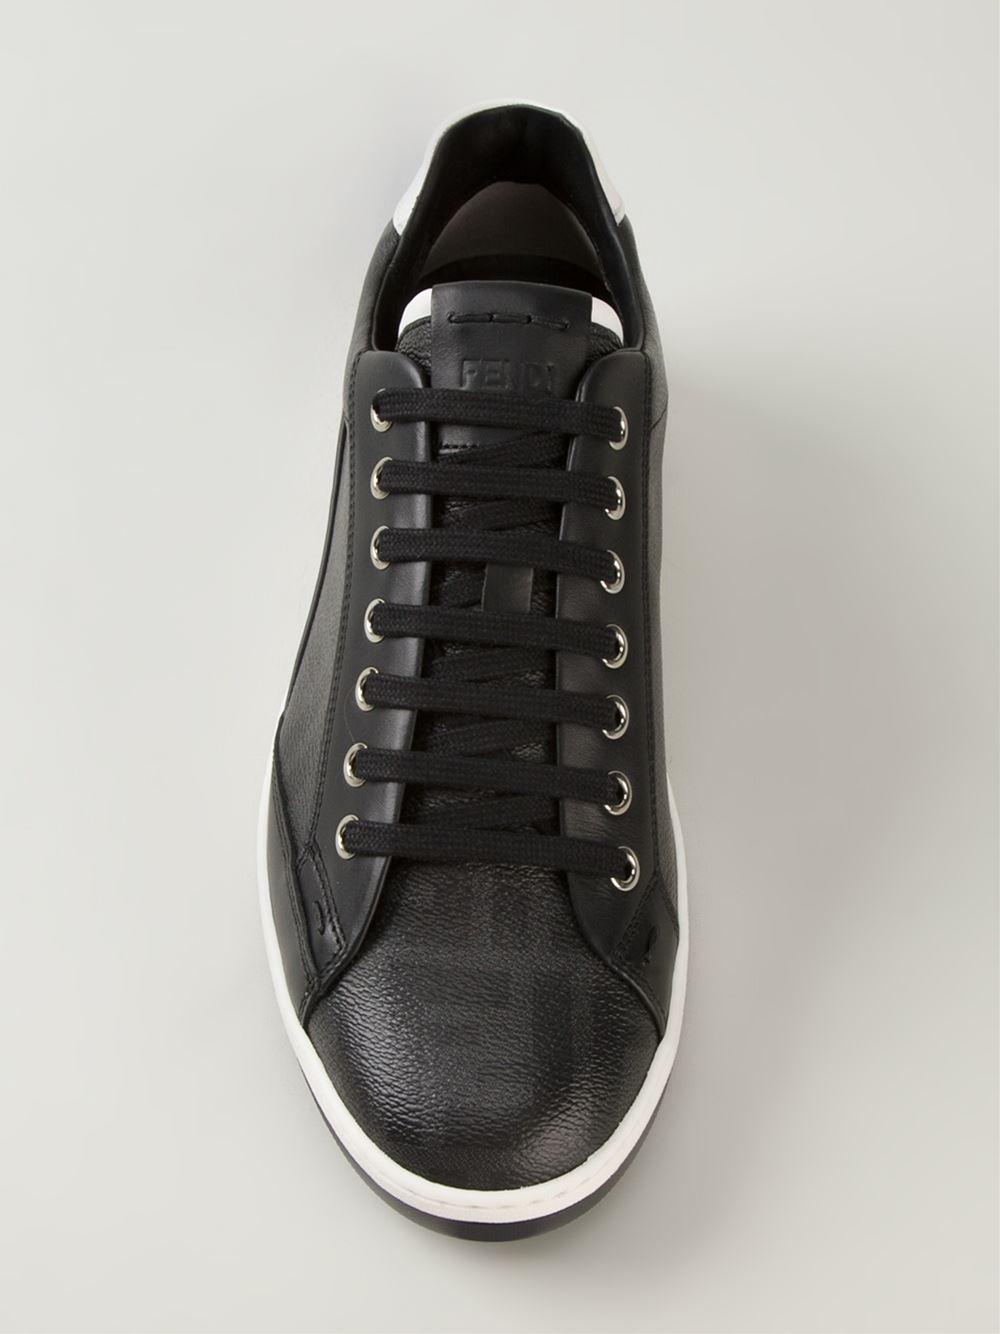 fendi wimbledon leather sneakers in black for men lyst